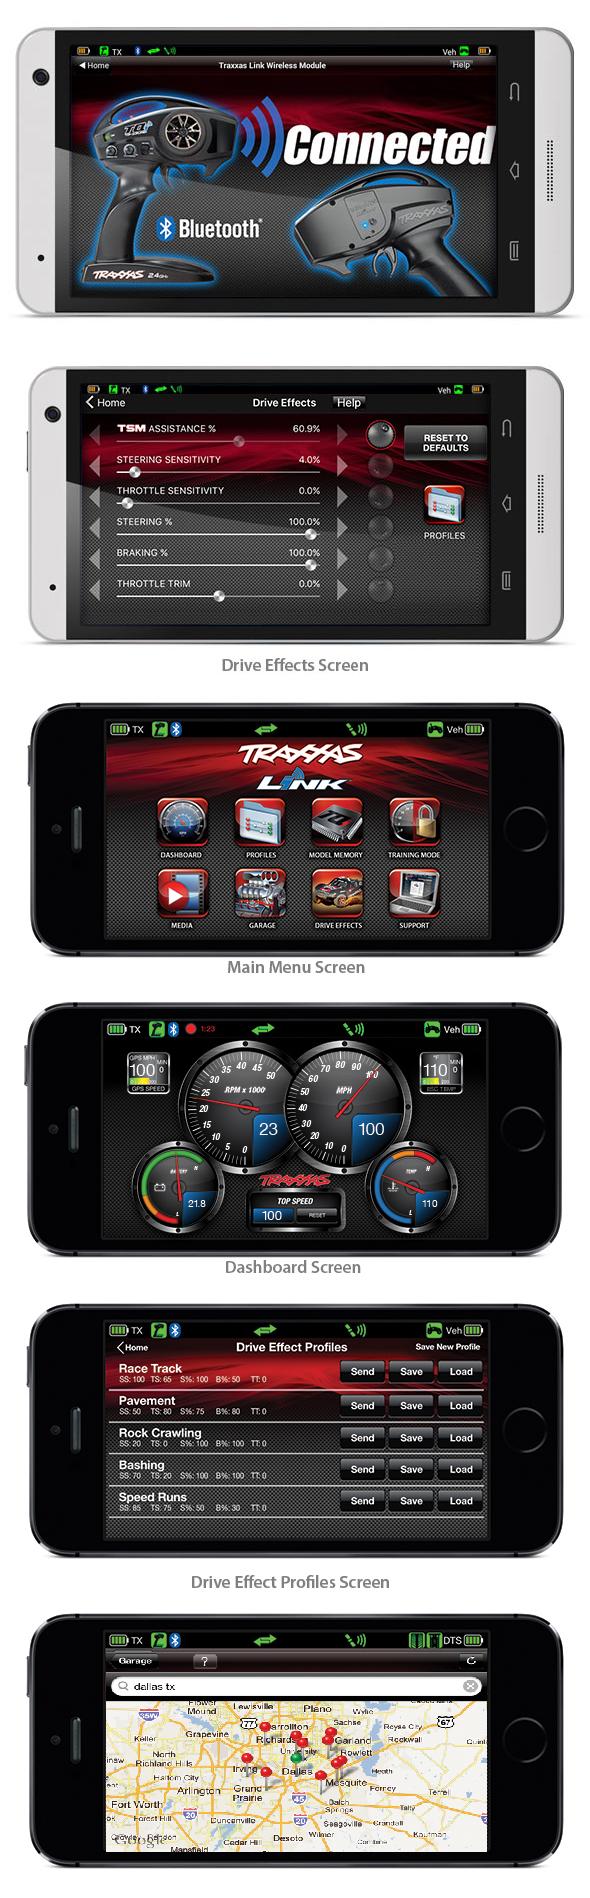 TRAXXAS Link App